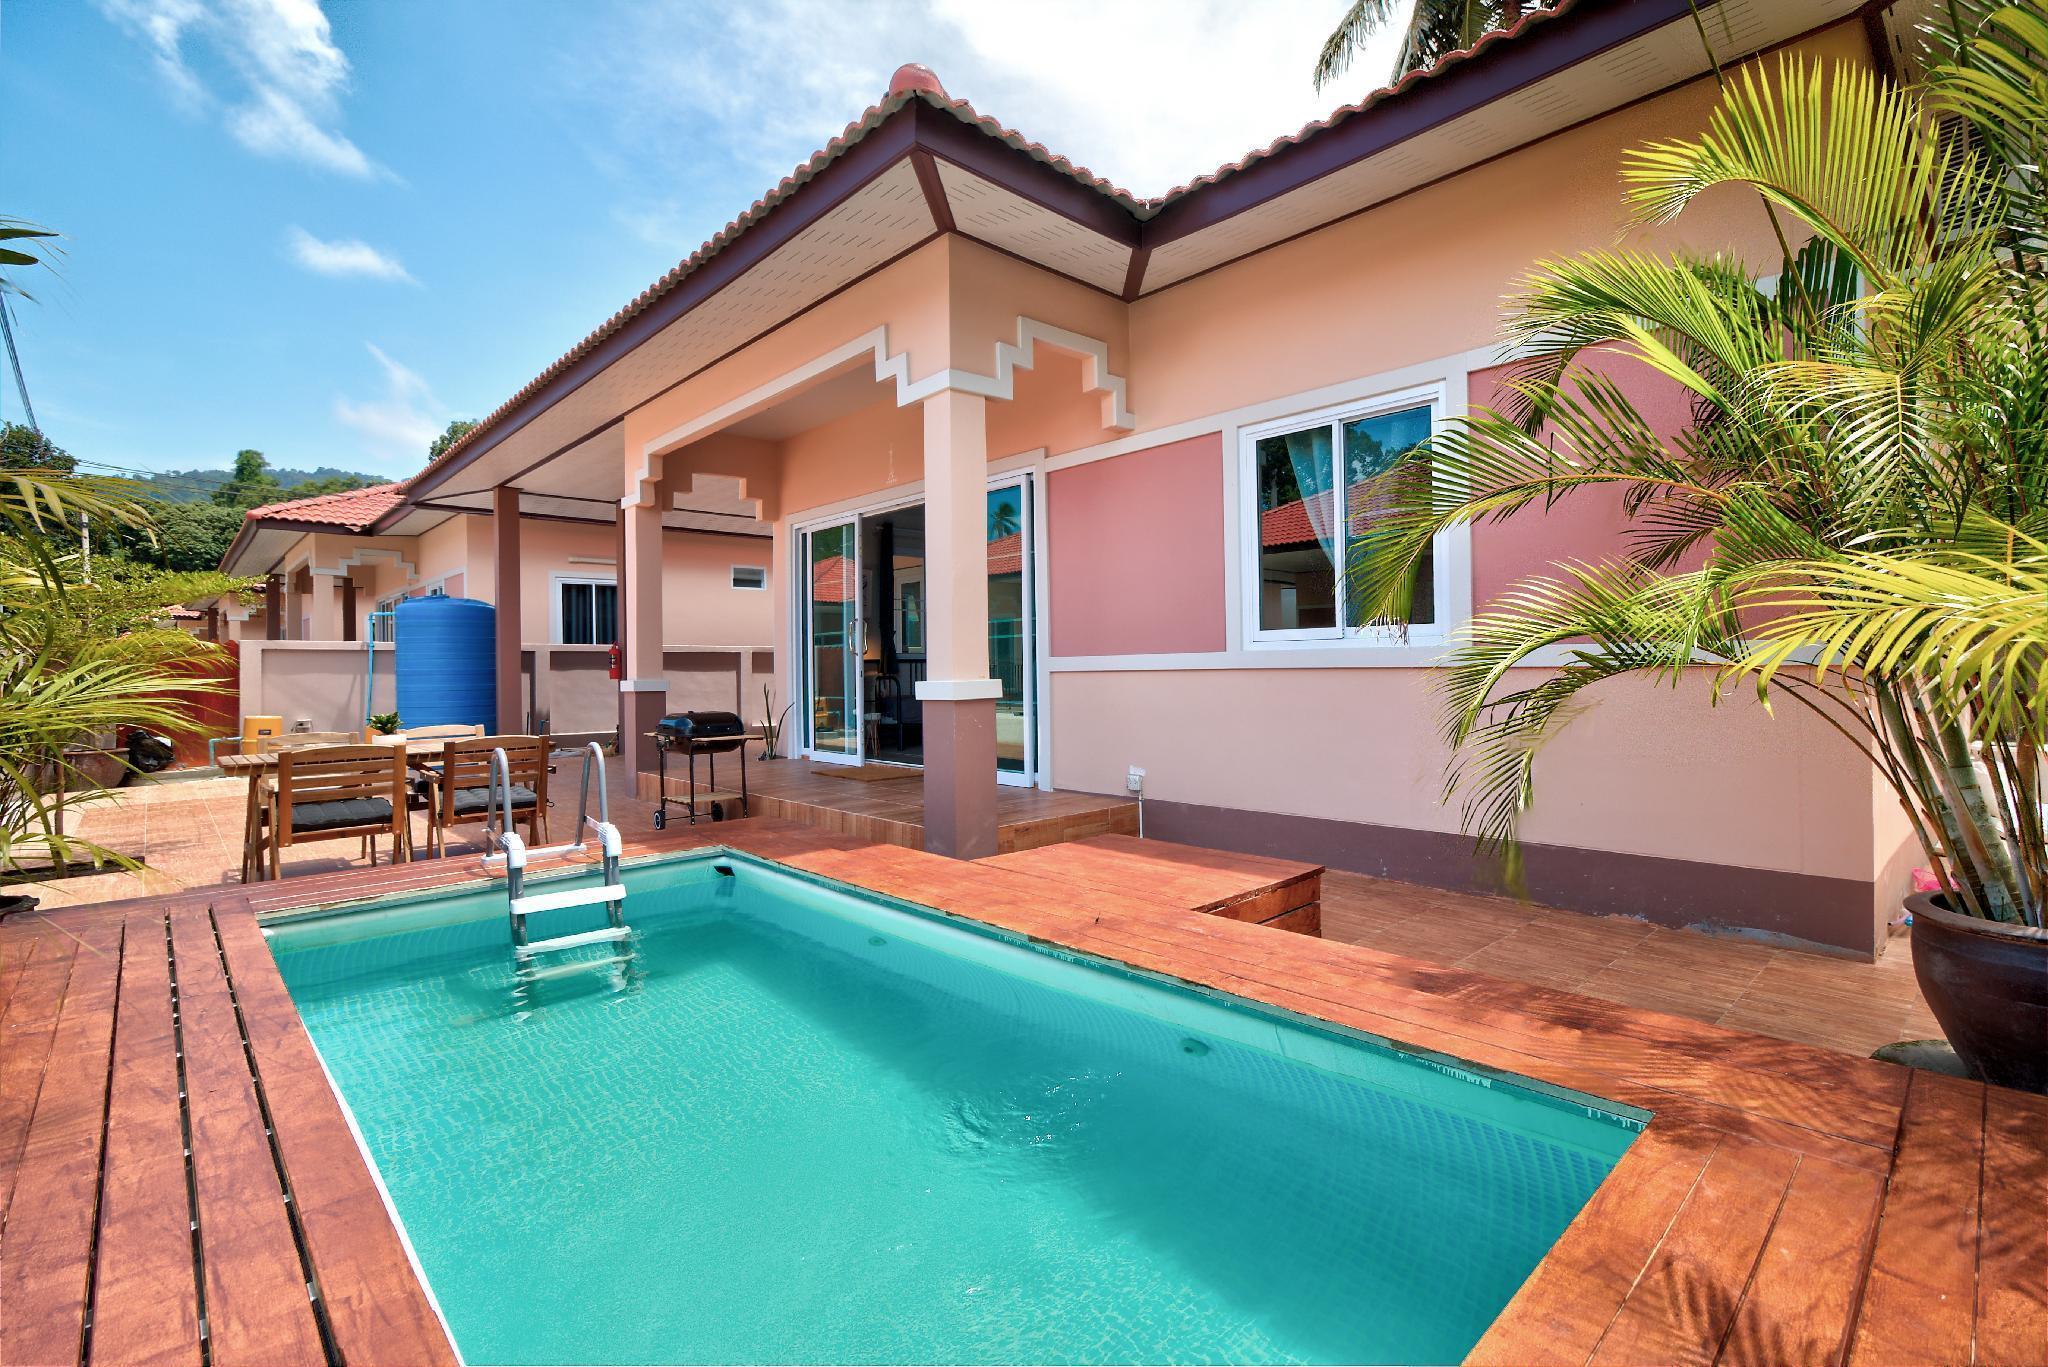 Brand New 3 Bedroom Pool Villa วิลลา 3 ห้องนอน 2 ห้องน้ำส่วนตัว ขนาด 500 ตร.ม. – แม่น้ำ